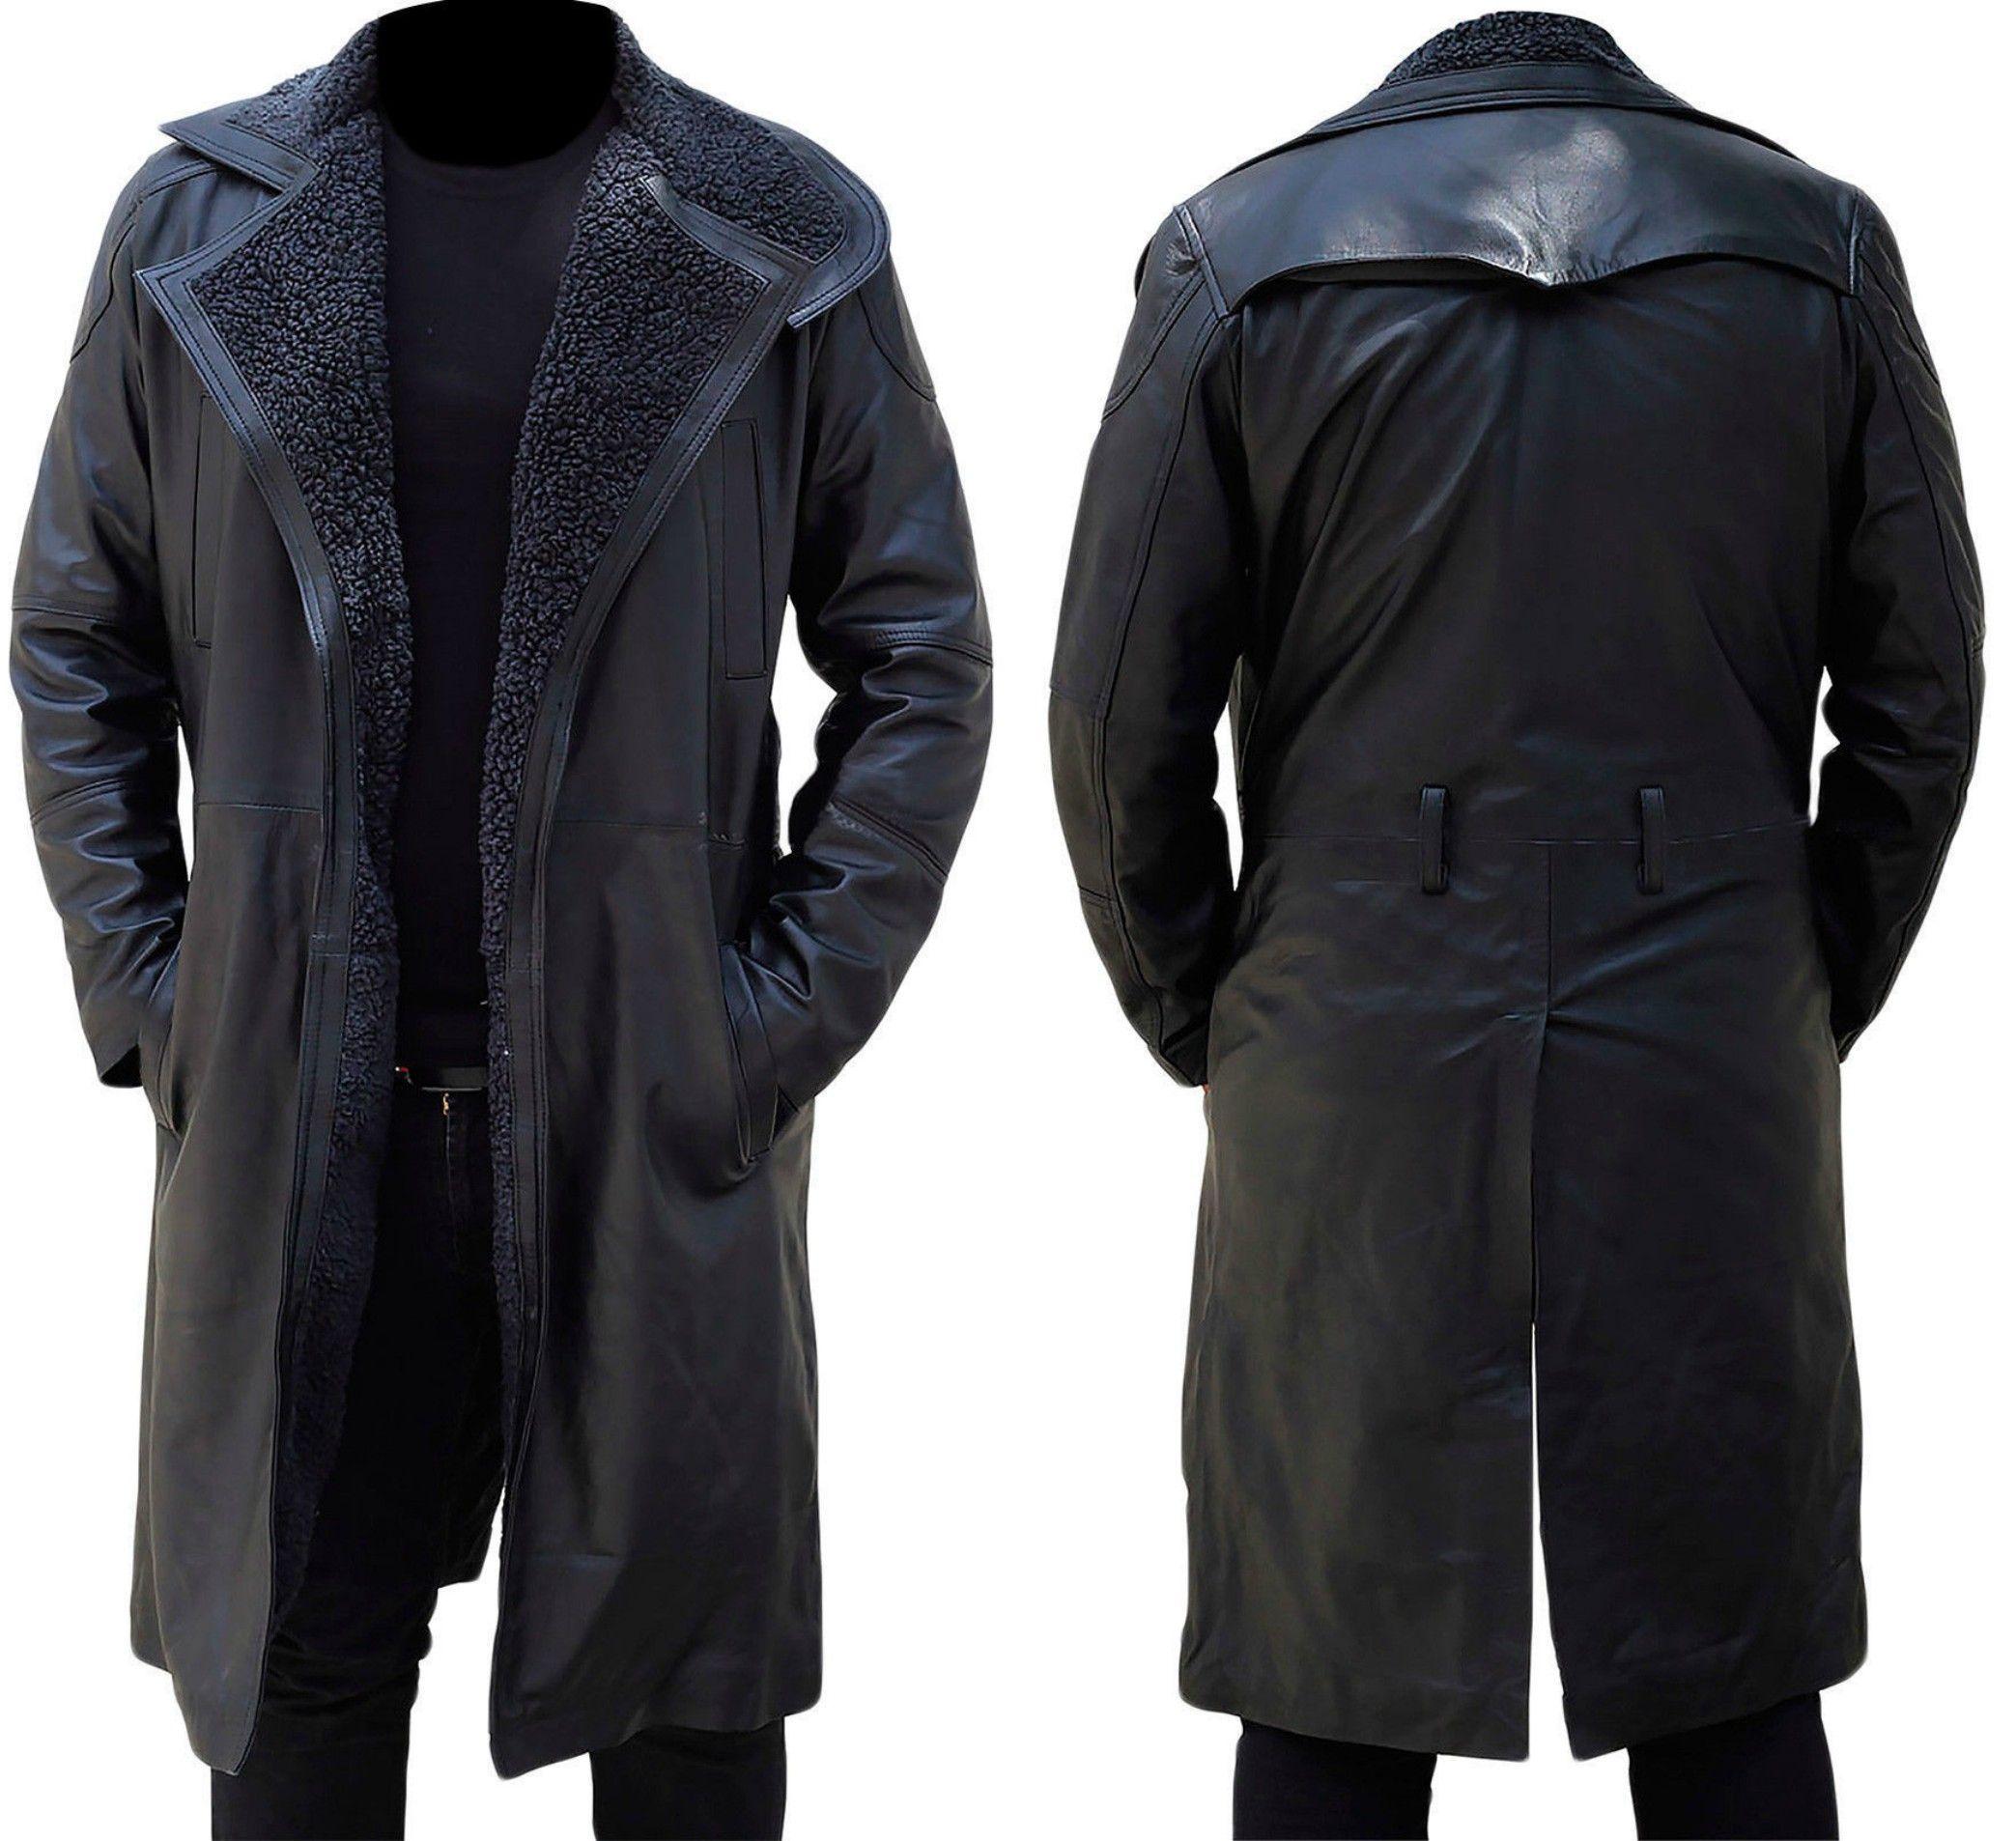 Xtreemleather present Ryan Gosling Blade Runner 2049